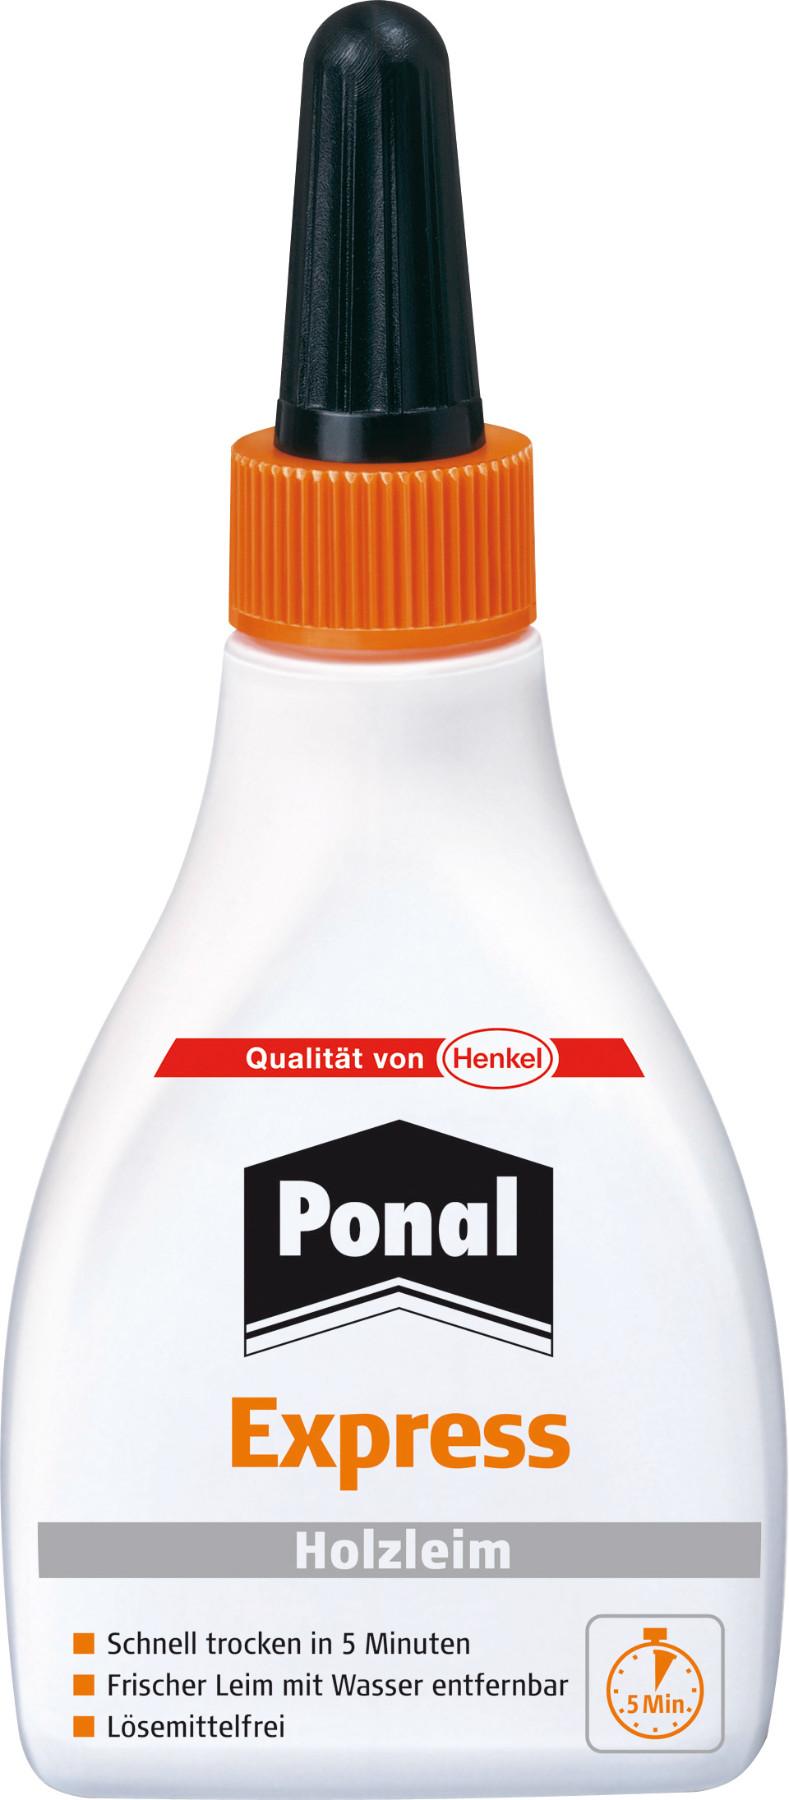 Ponal Express